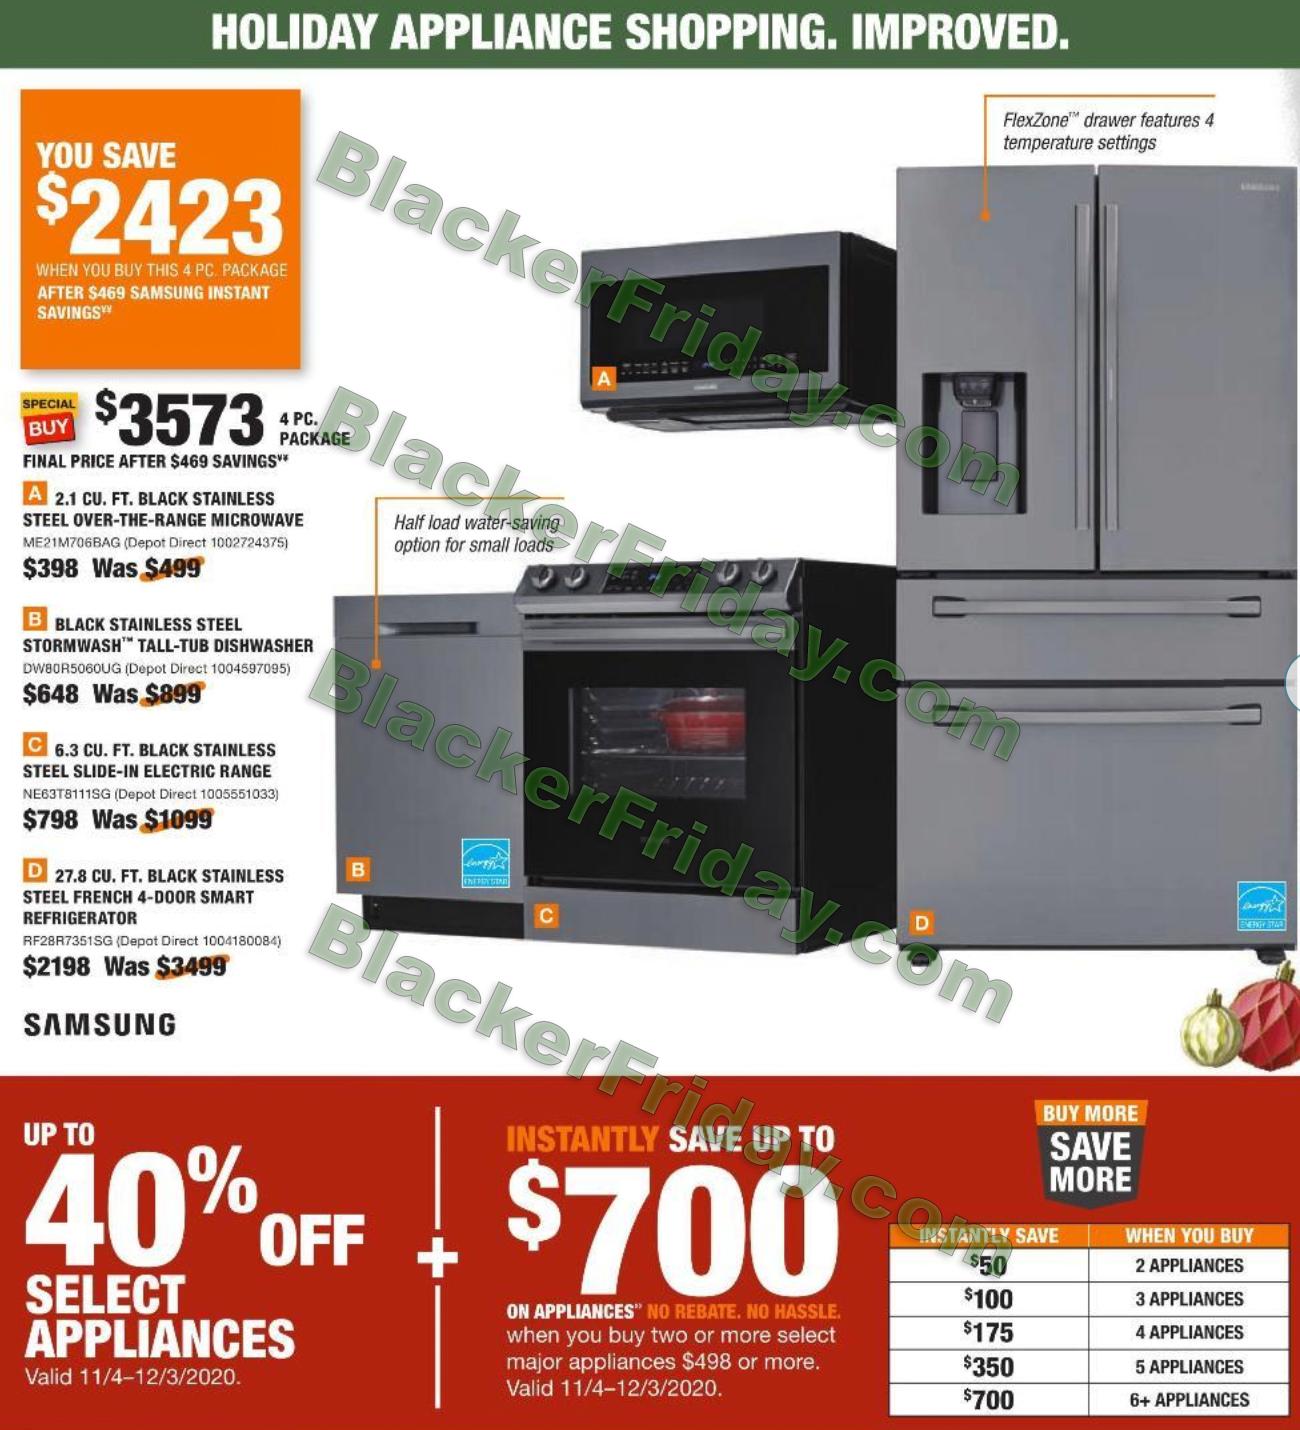 Home Depot Black Friday Deals 2020 Appliances Black Friday Appliance Deals 2020